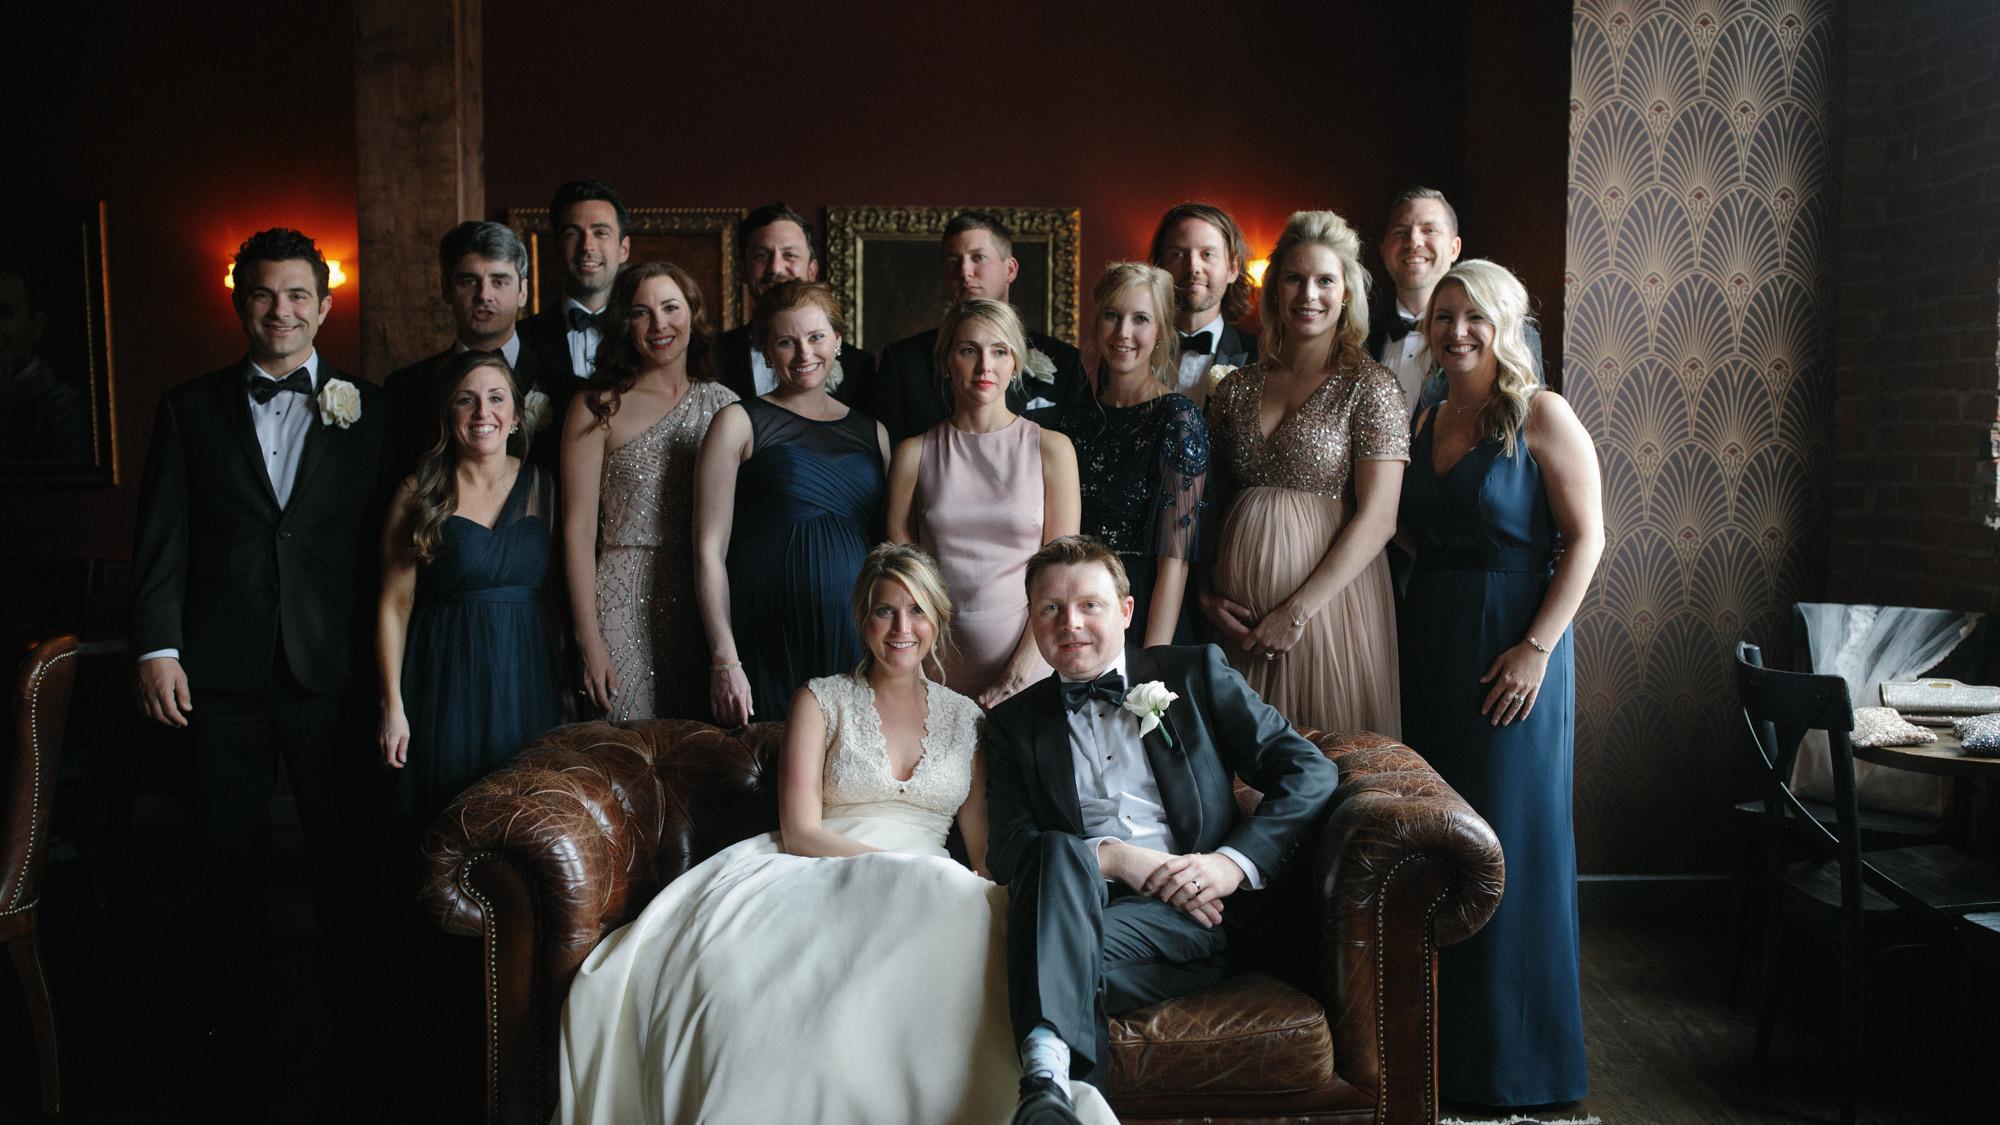 Alec_Vanderboom_kansas_city_hip_wedding_photos-0035.jpg